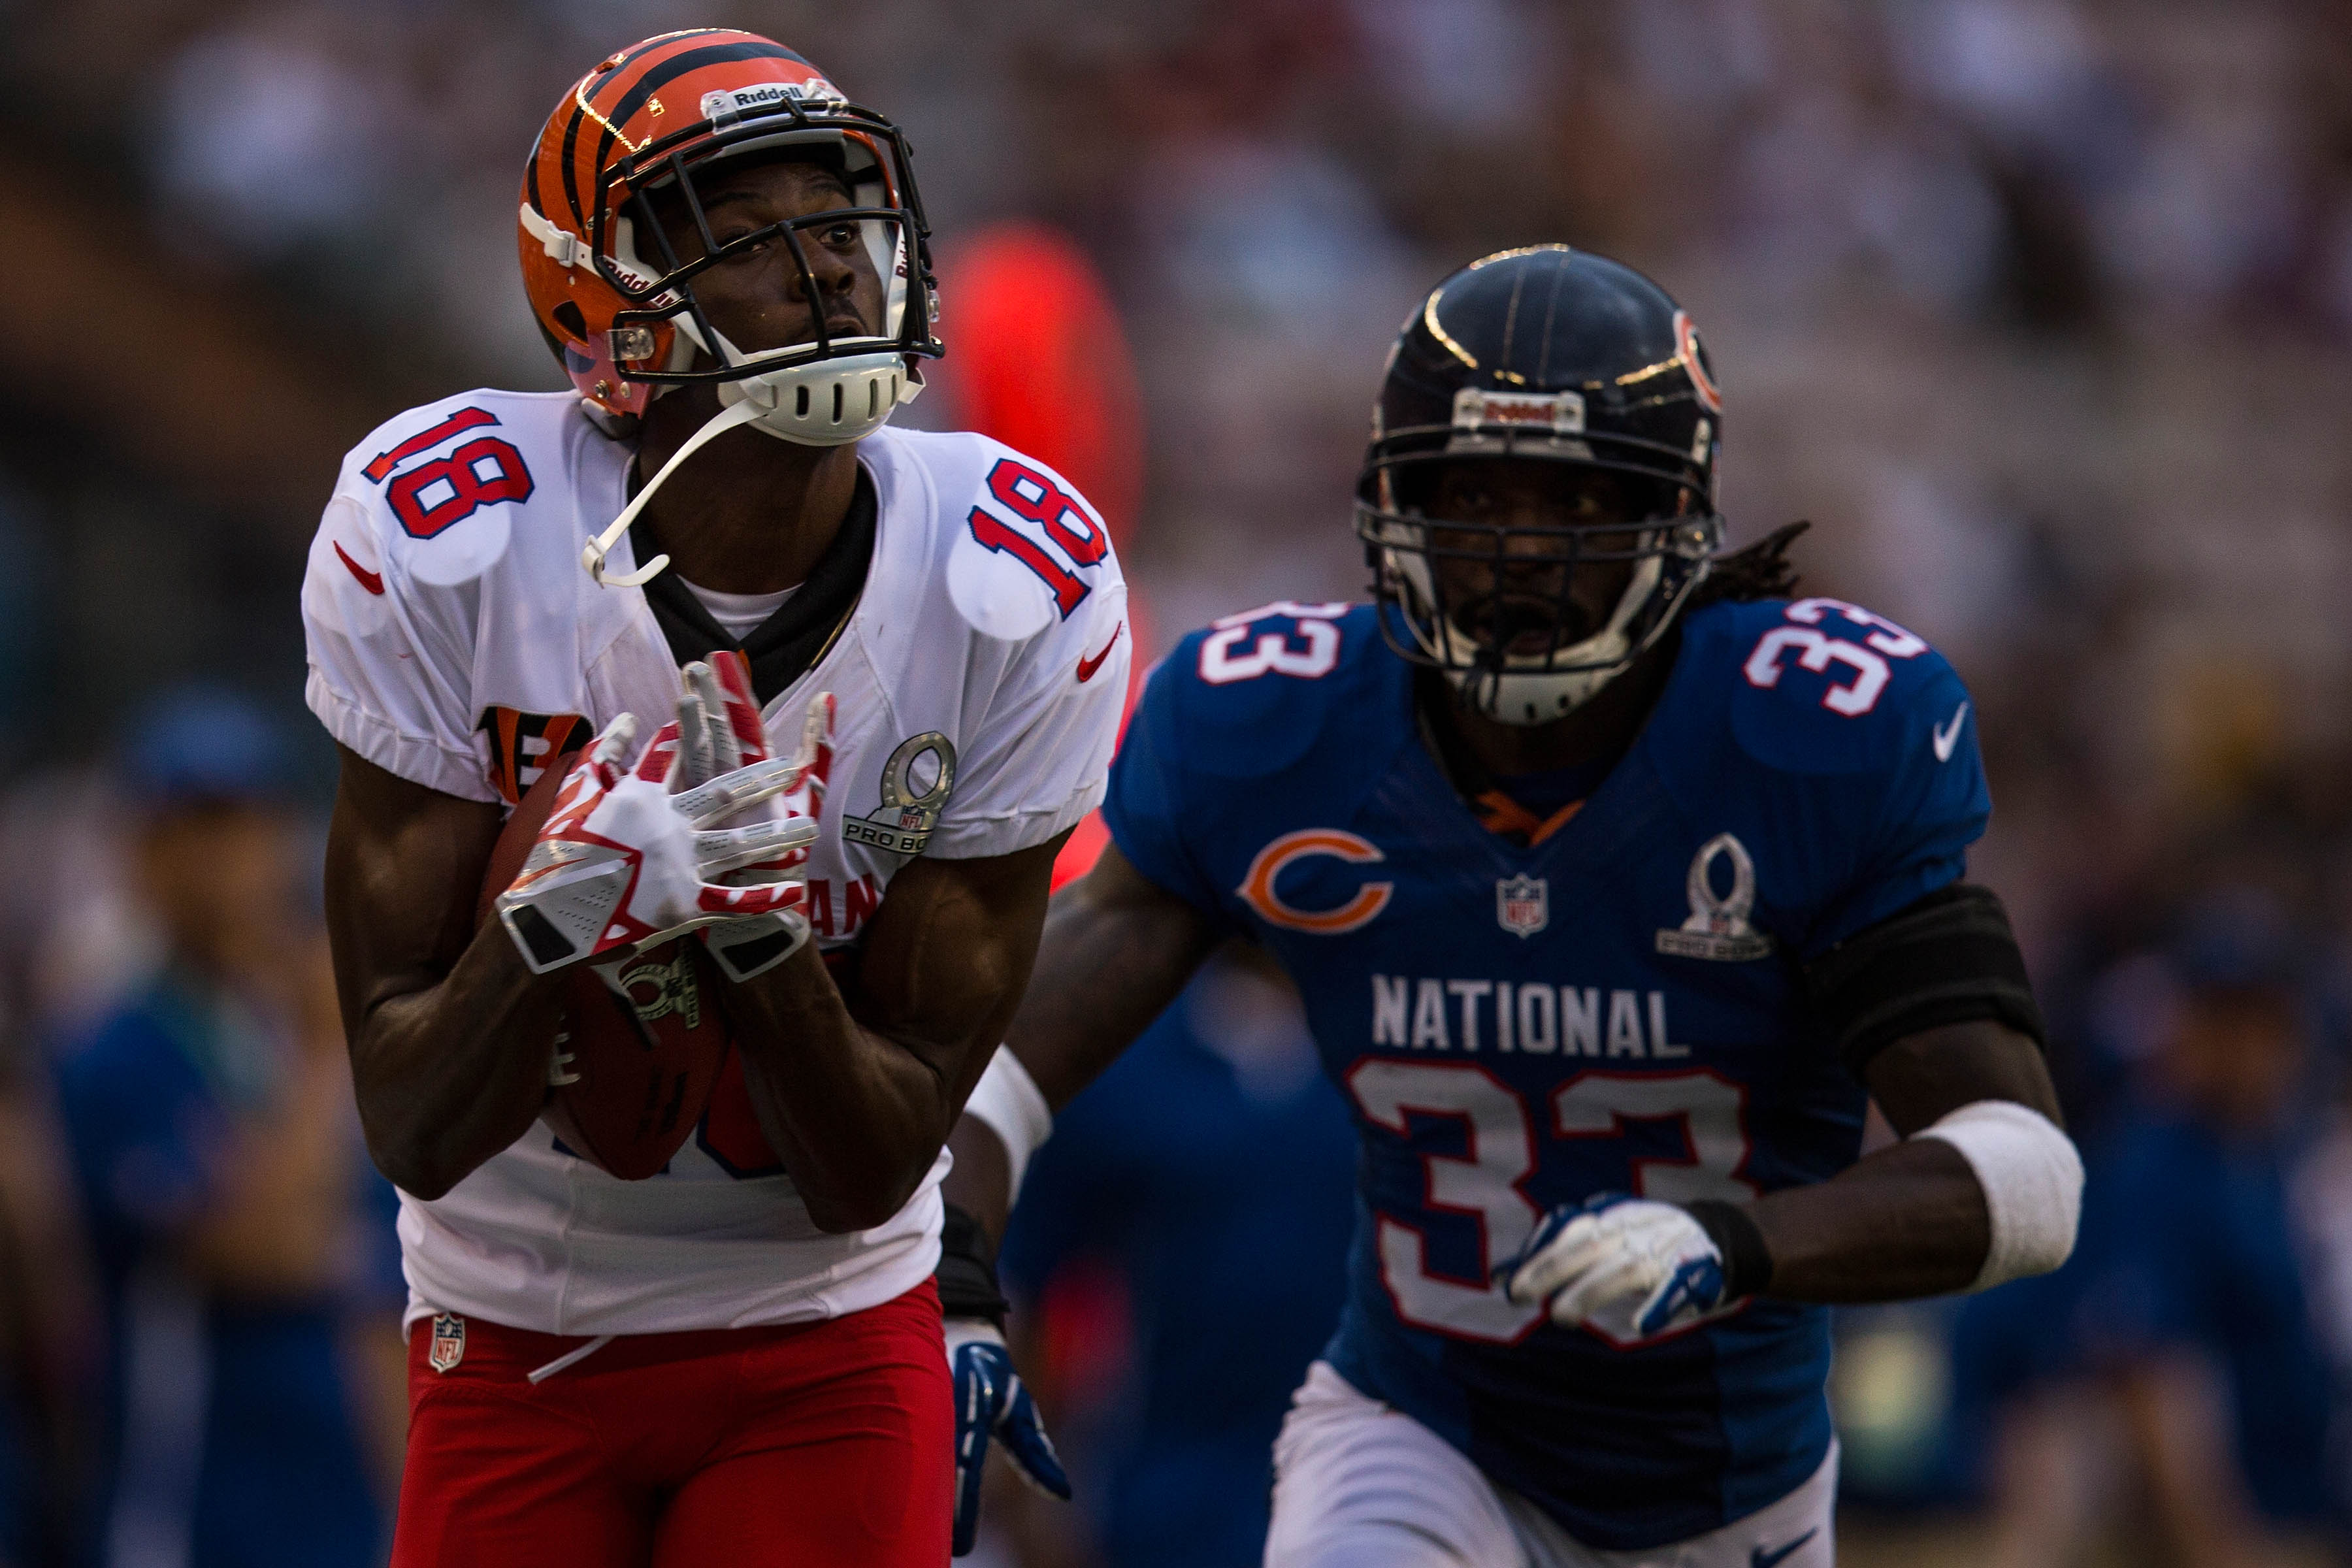 Green, Atkins to represent Cincinnati Bengals in Pro Bowl